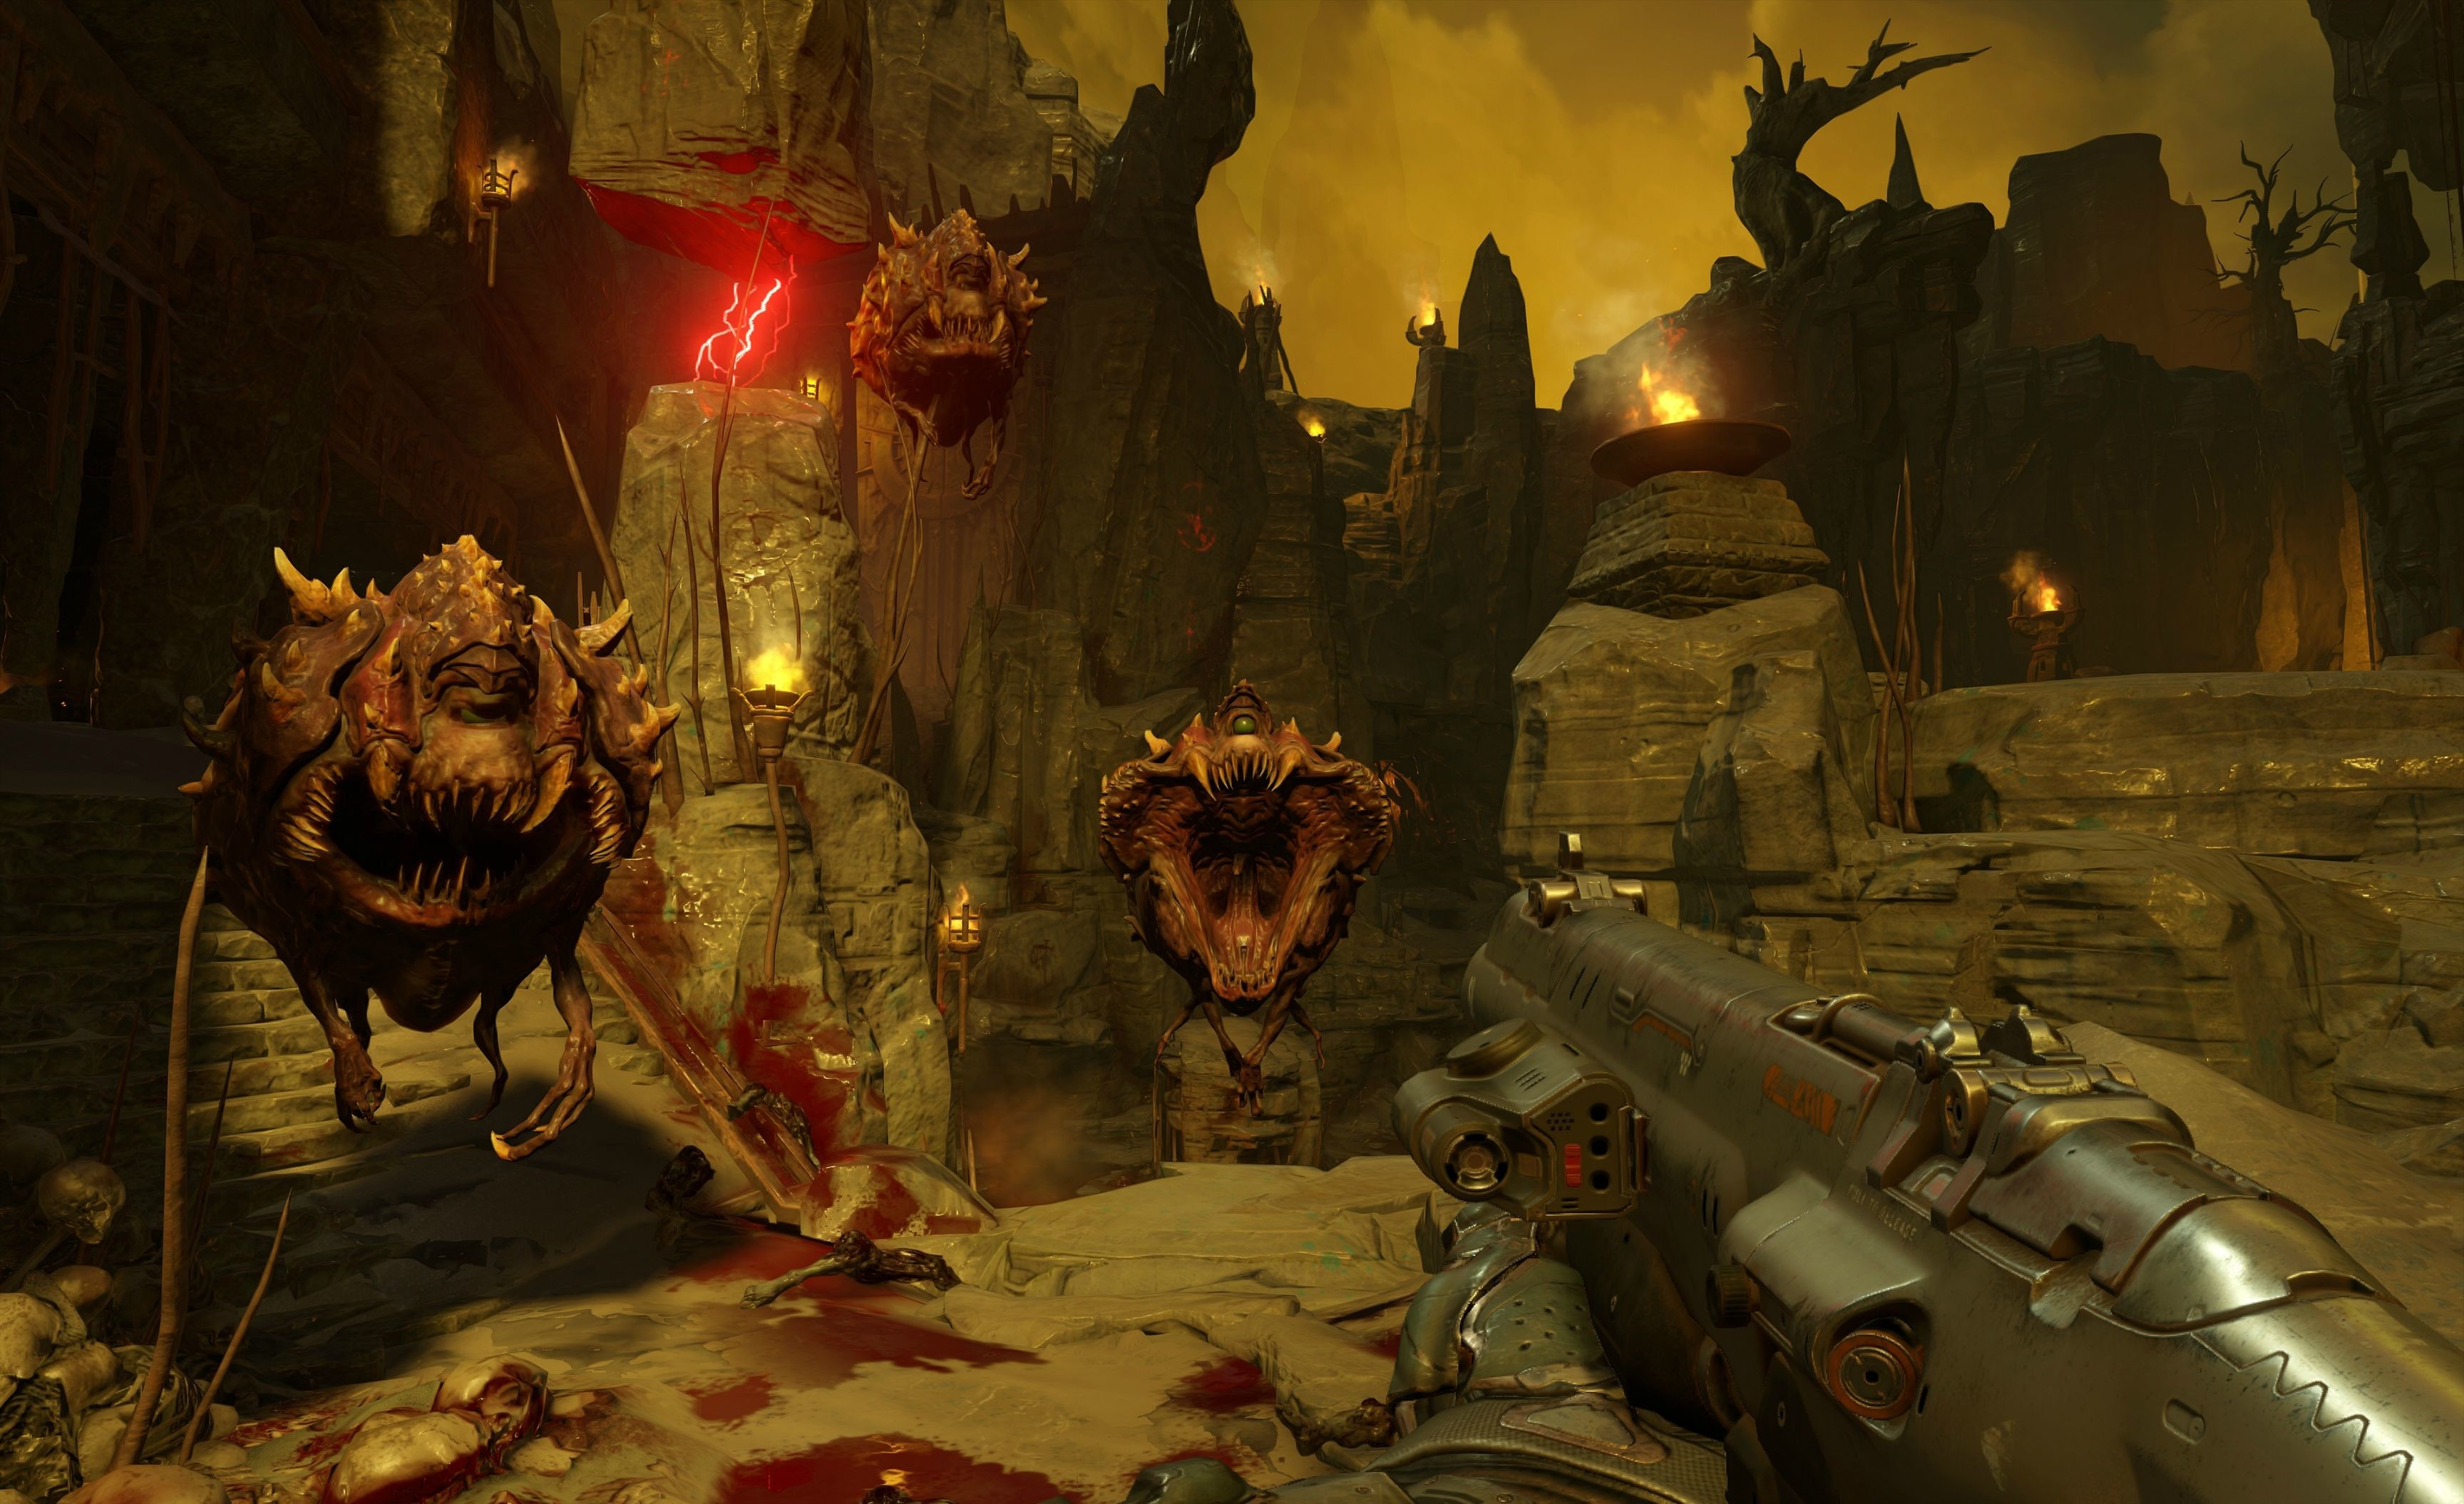 Res: 3456x2109, Doom 4 Video Game Wallpaper